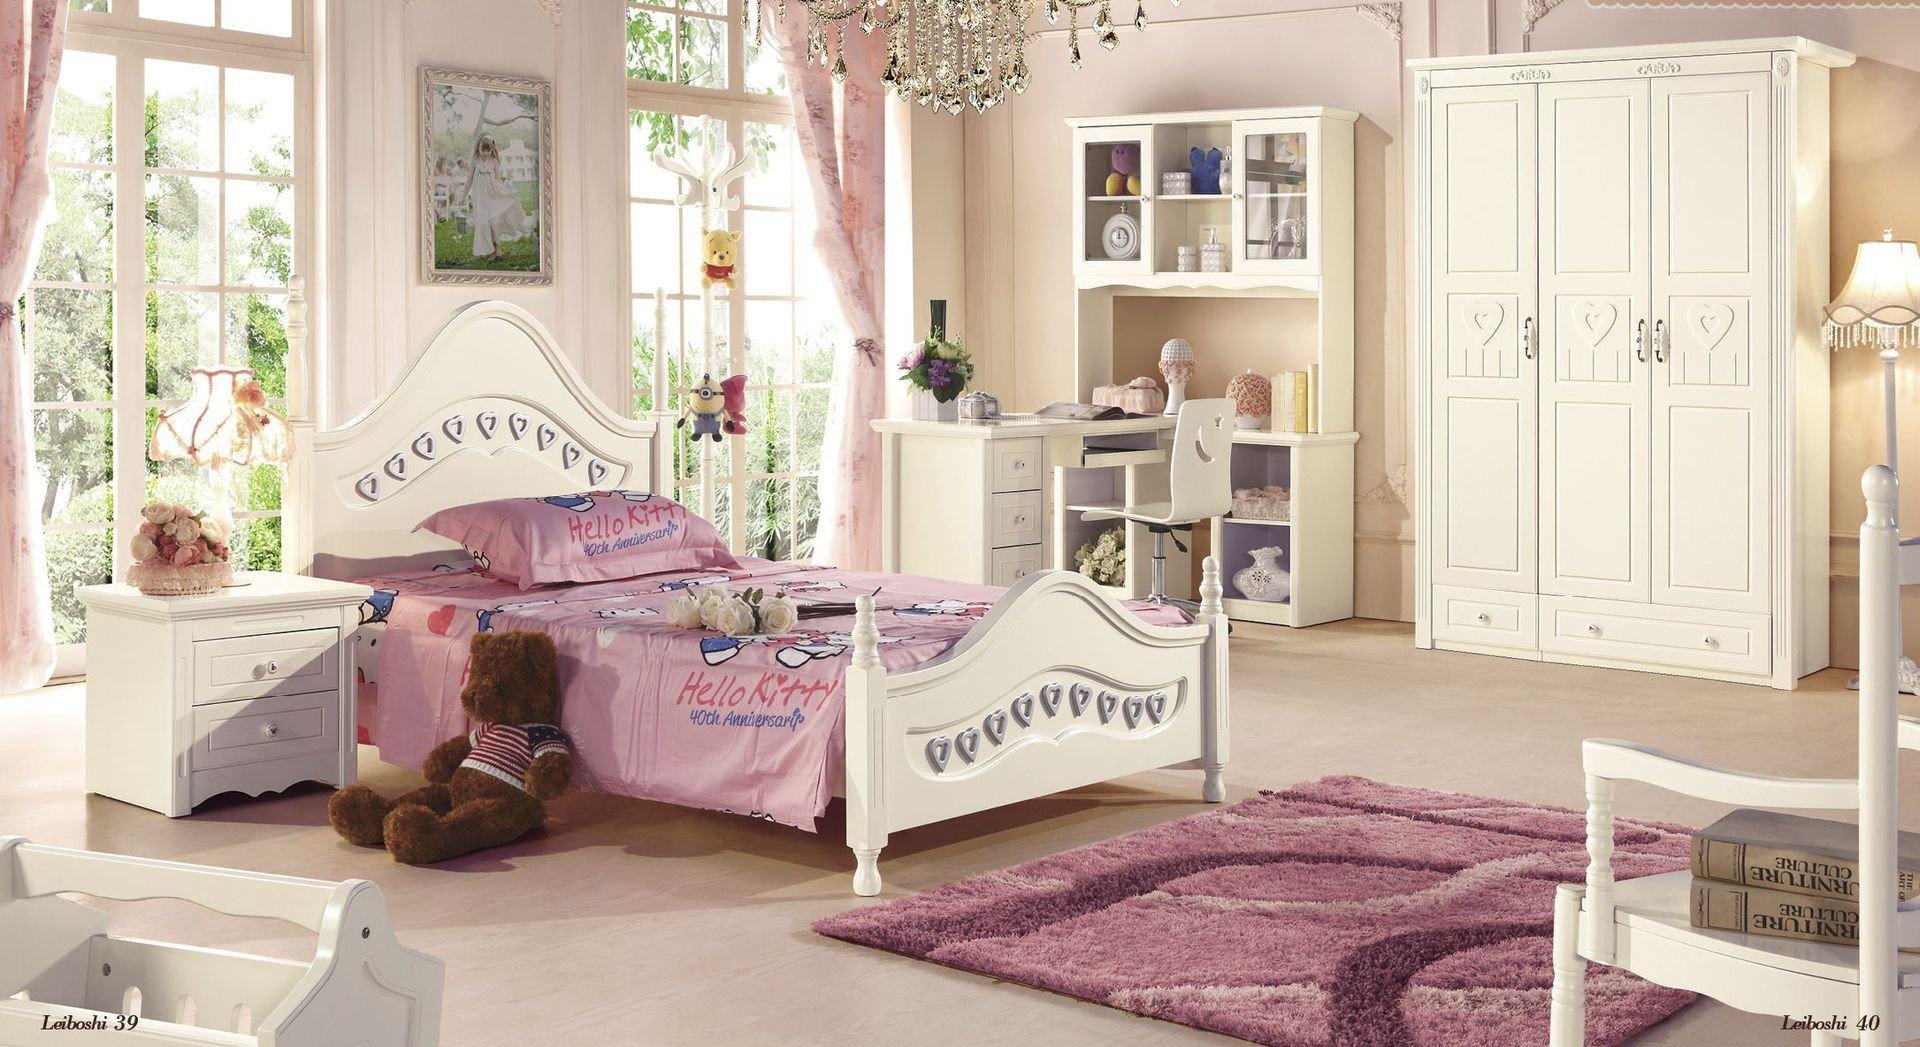 Childrens Bedroom Furniture Set Beautiful solid Wood Bedroom Furniture for Kids